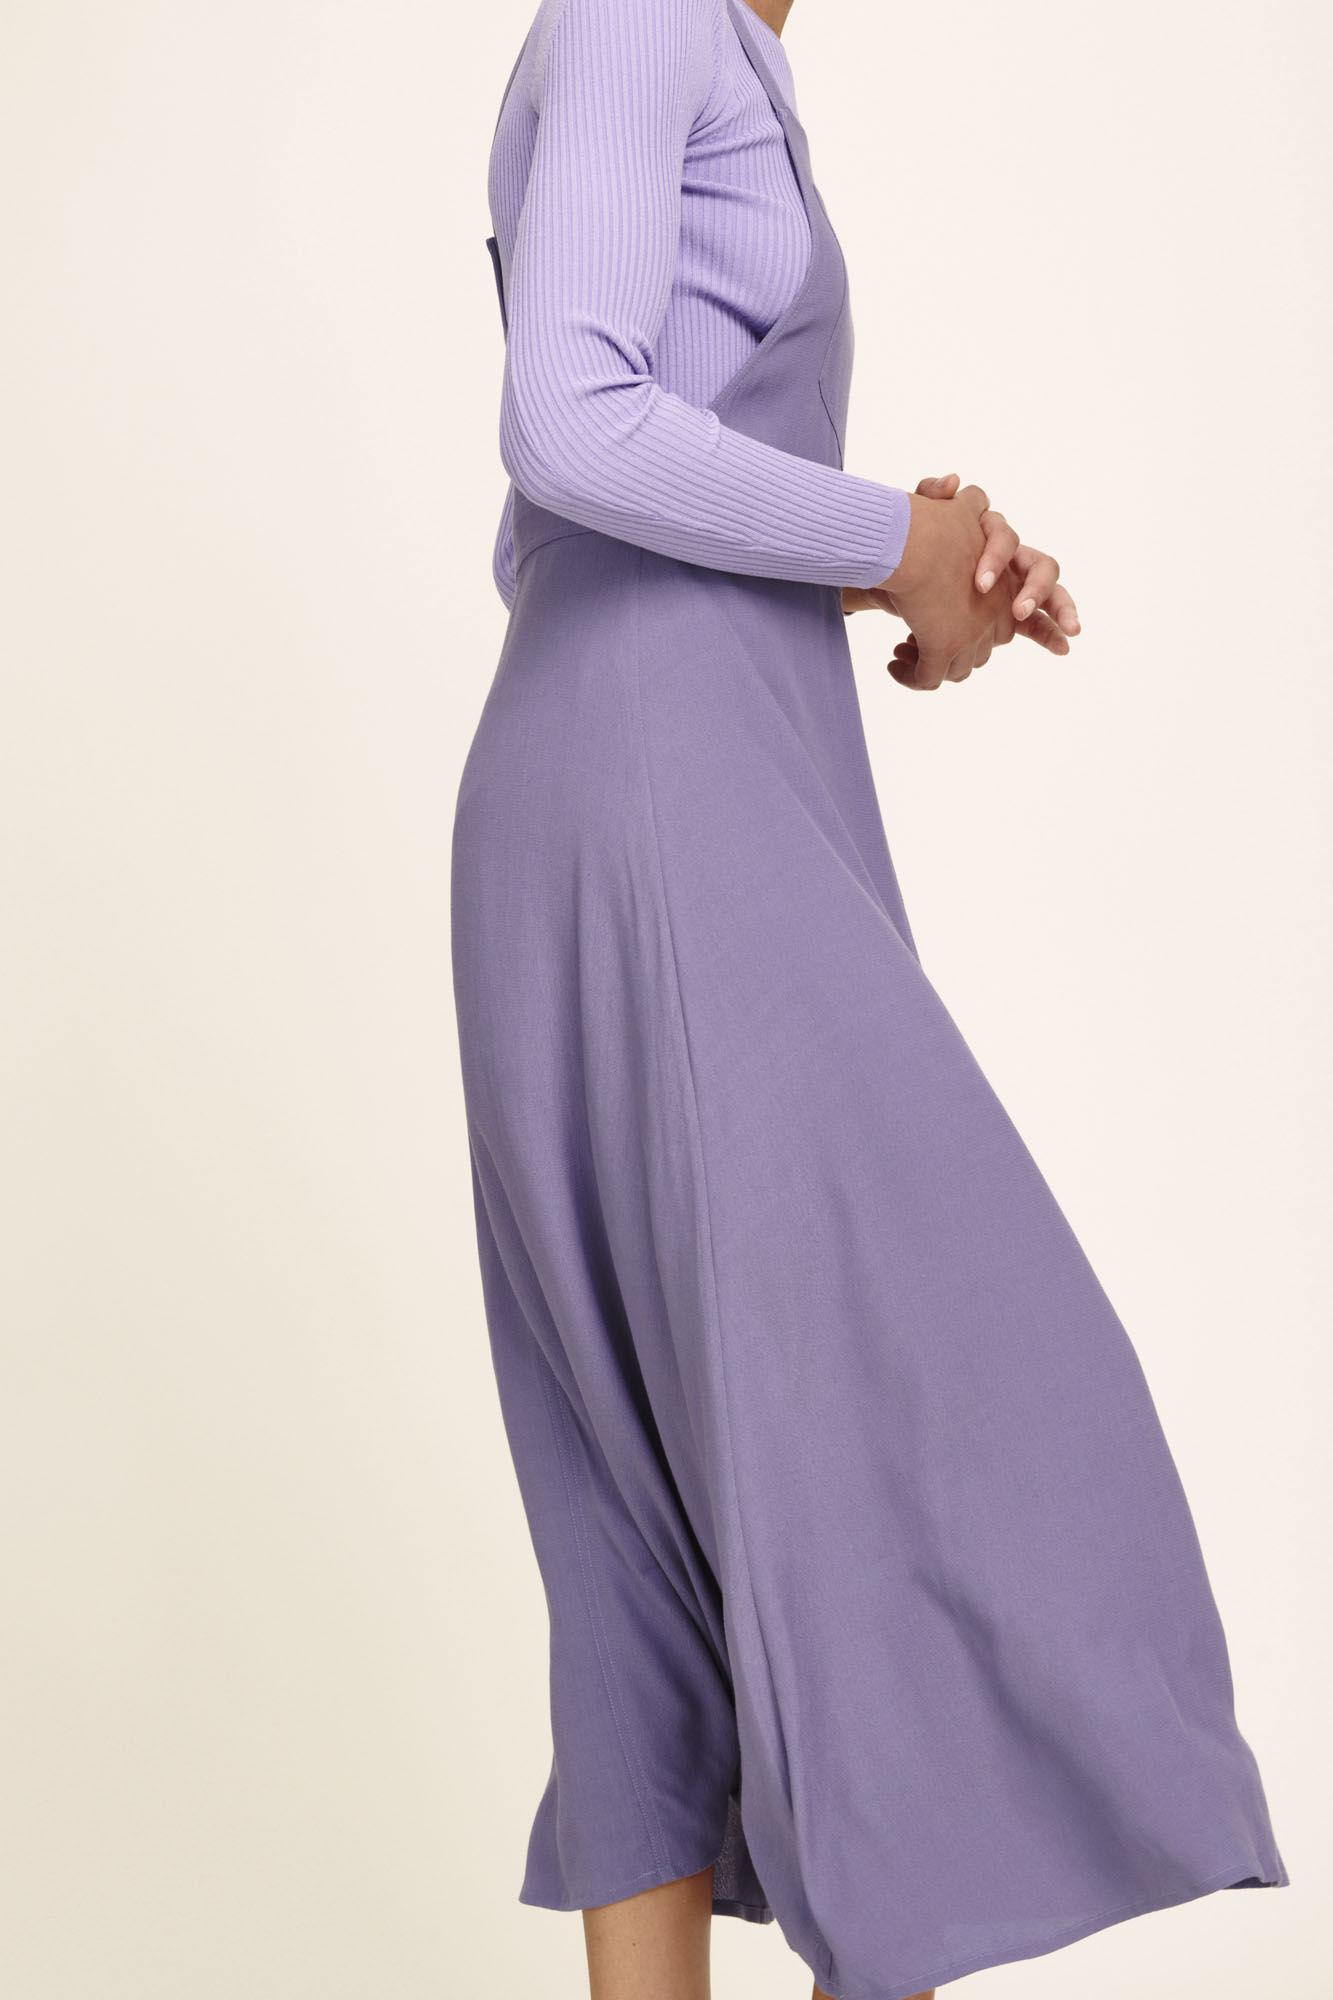 Elder dress 6515